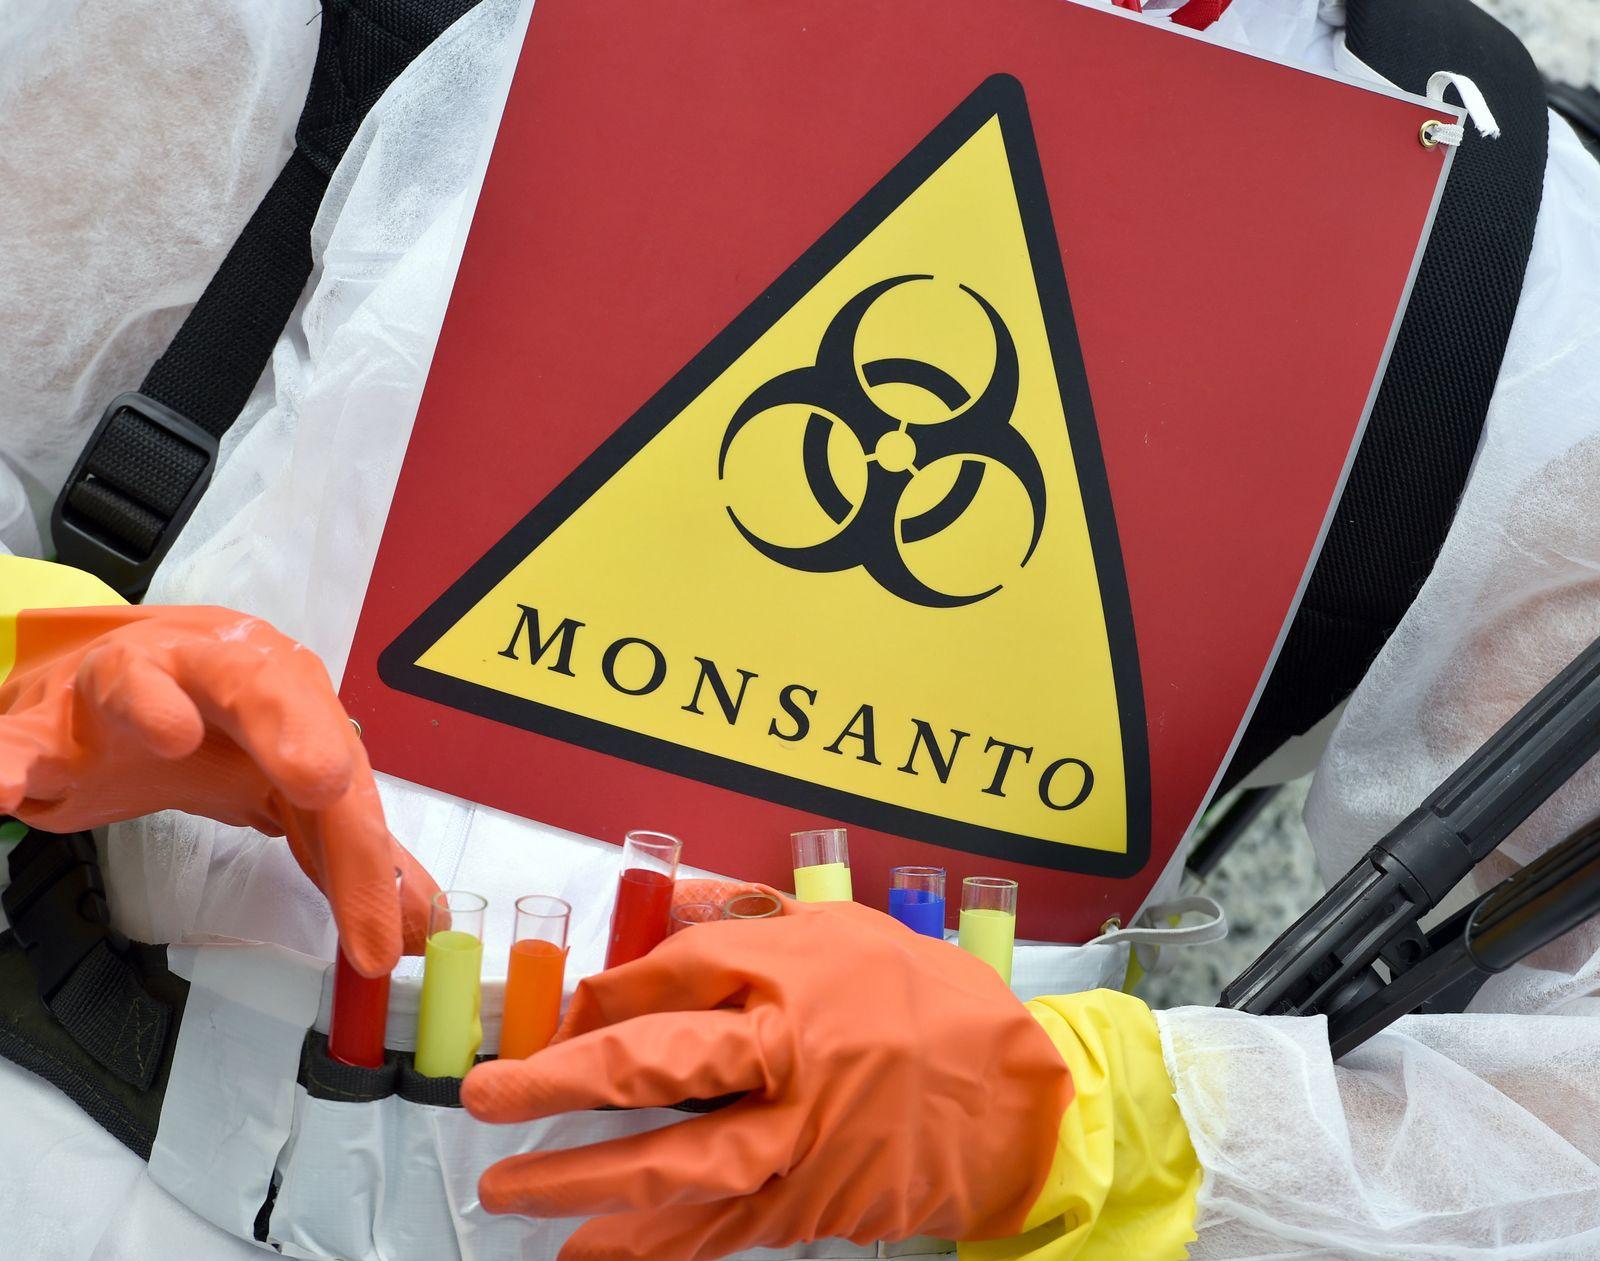 Monsanto/ Glyphosat